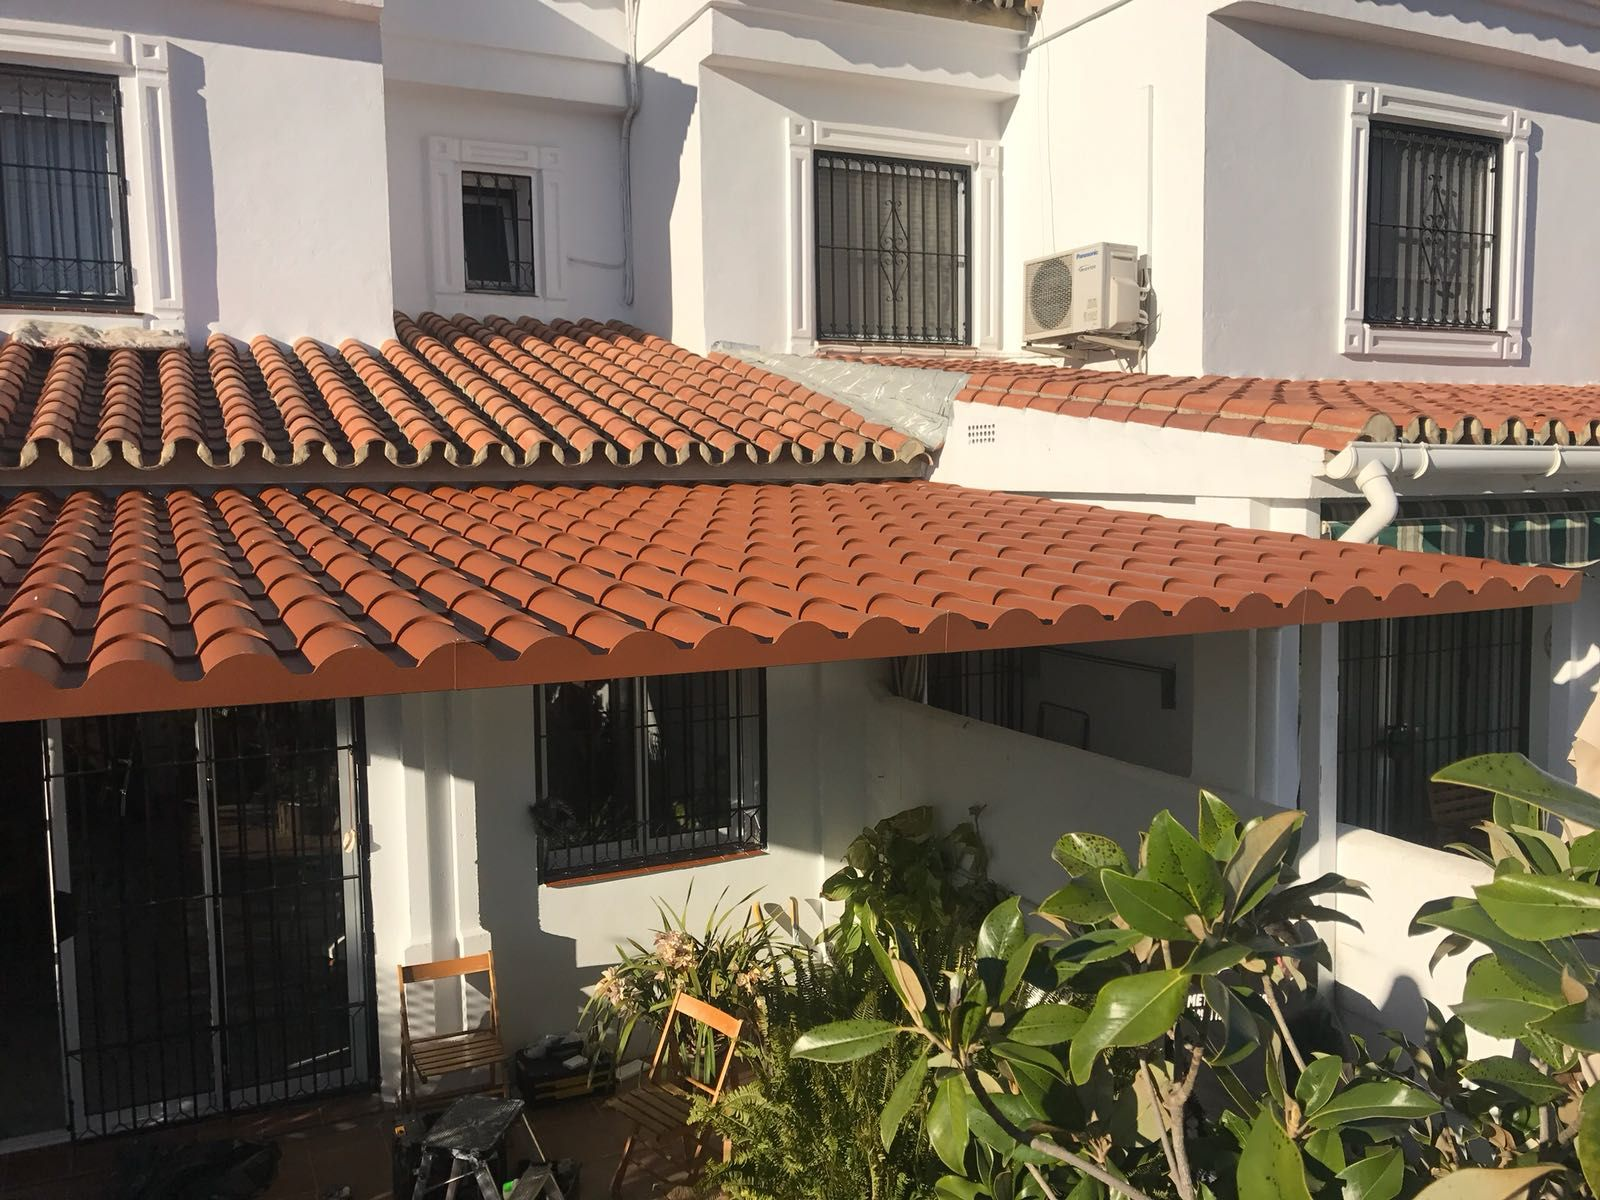 Terraza exterior con acristalamientos